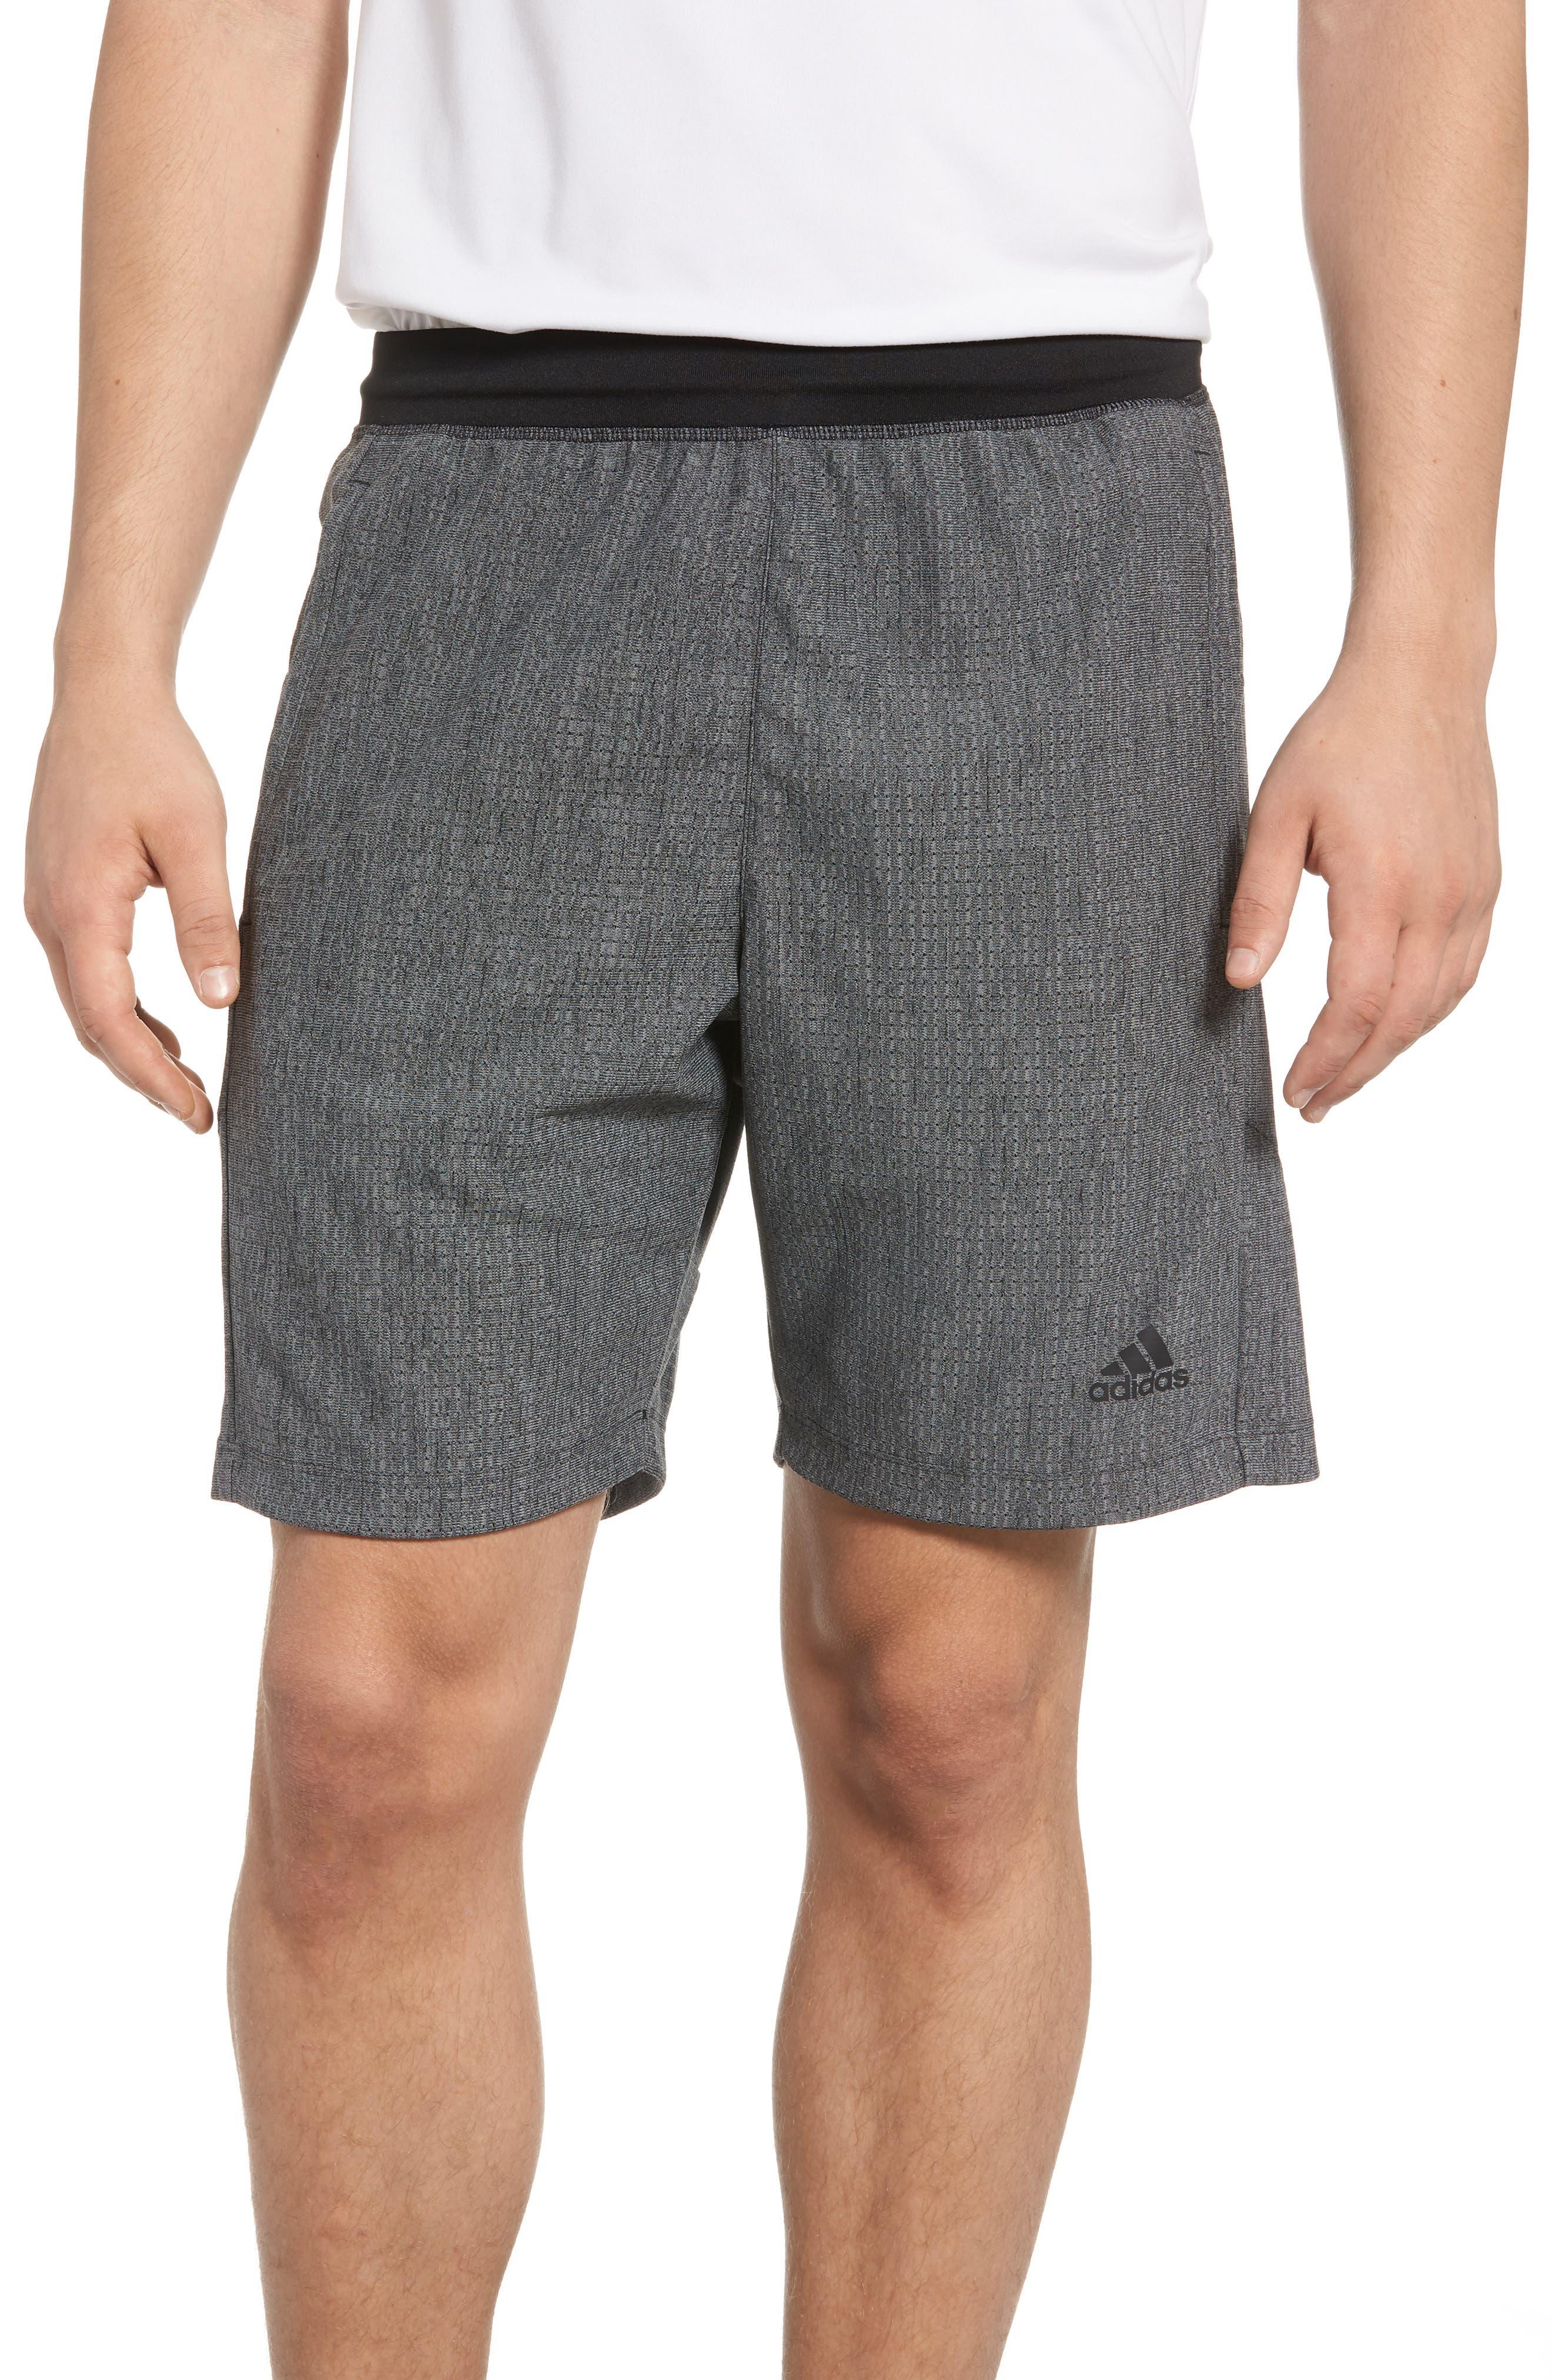 Speedbreaker Shorts,                         Main,                         color, 036